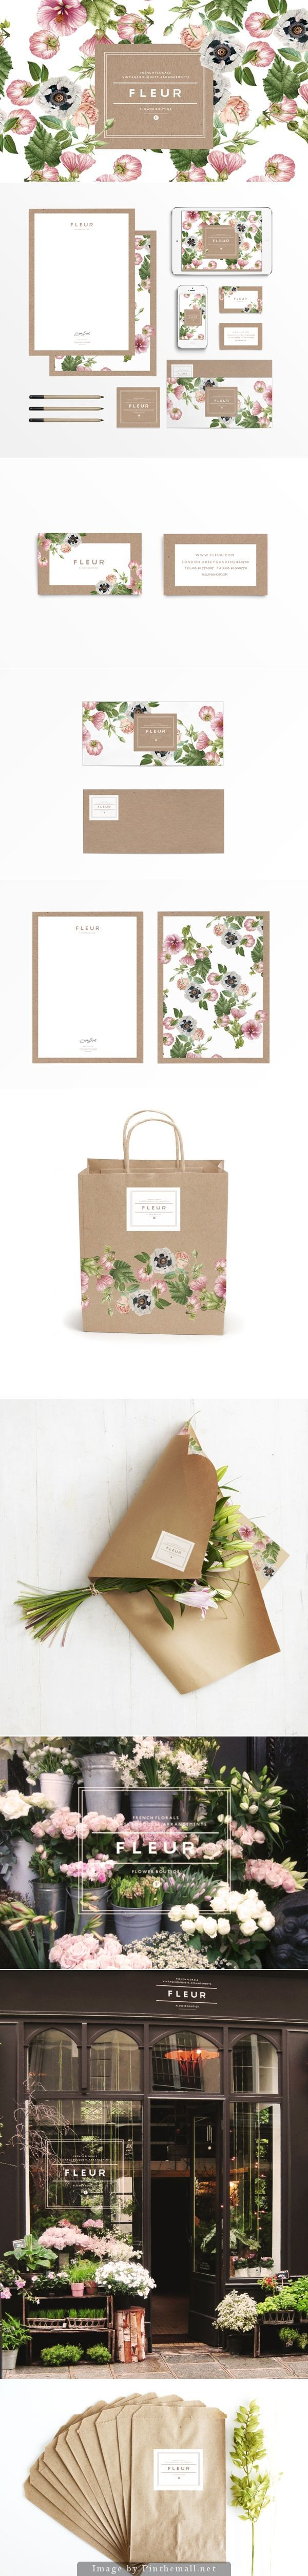 FLEUR Flower Shop Branding